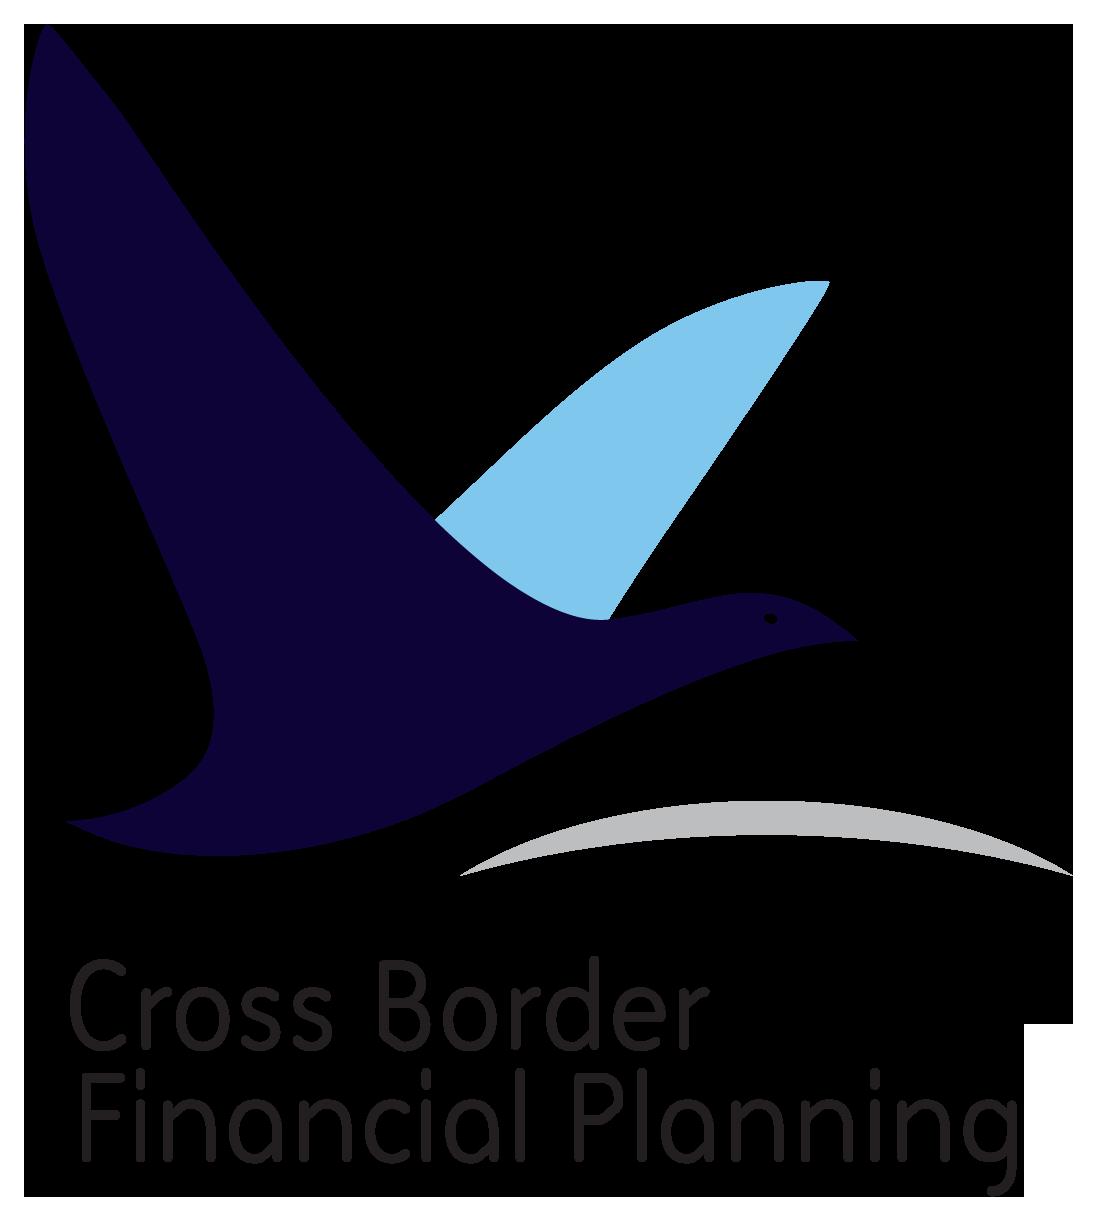 Cross Border Financial Planning Limited